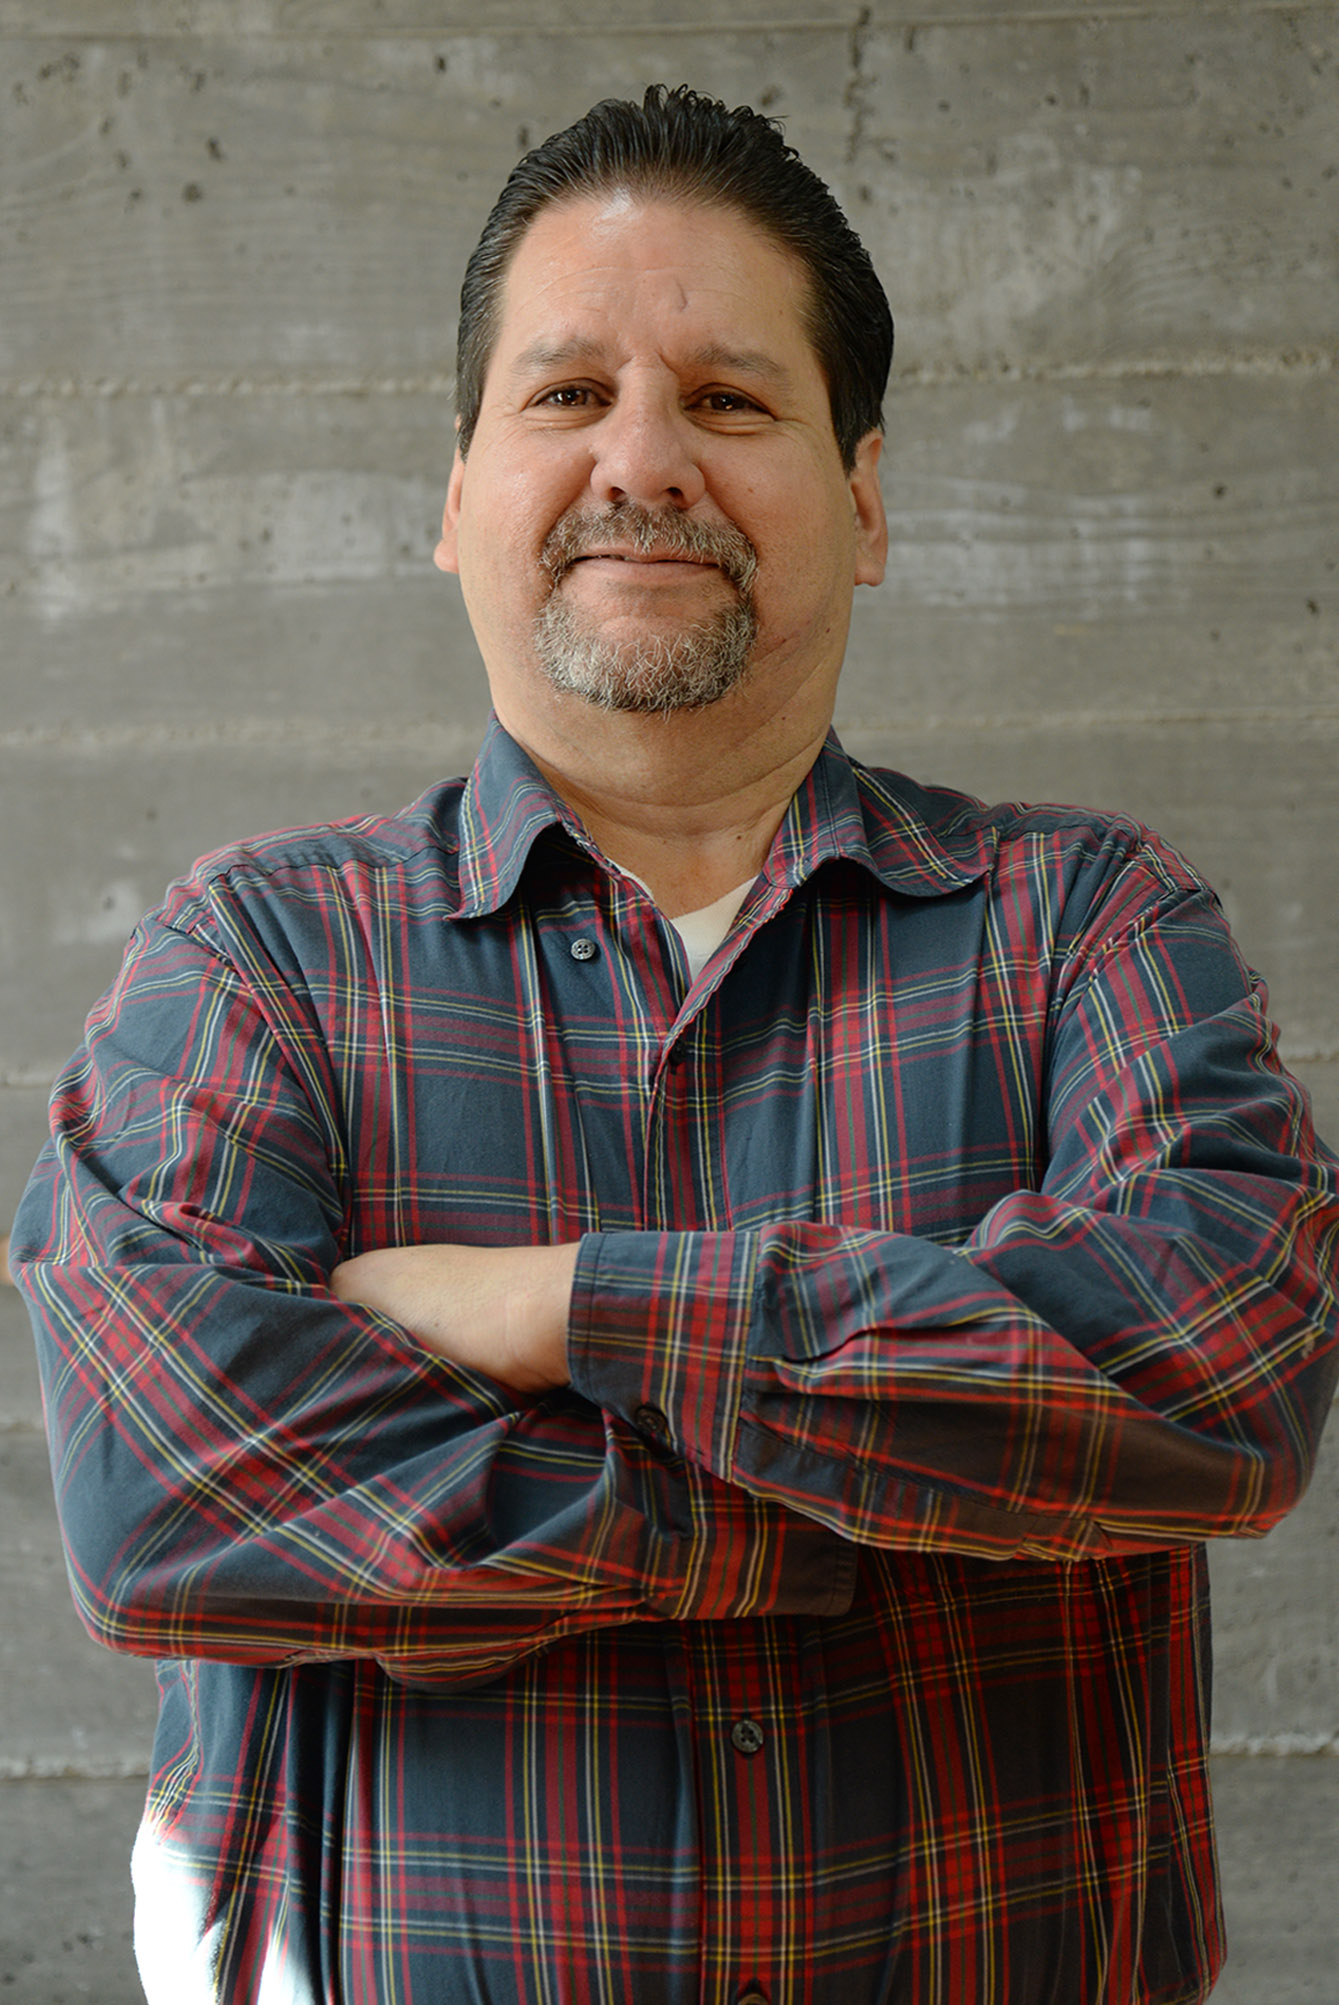 Danny Ramirez - Owner, President